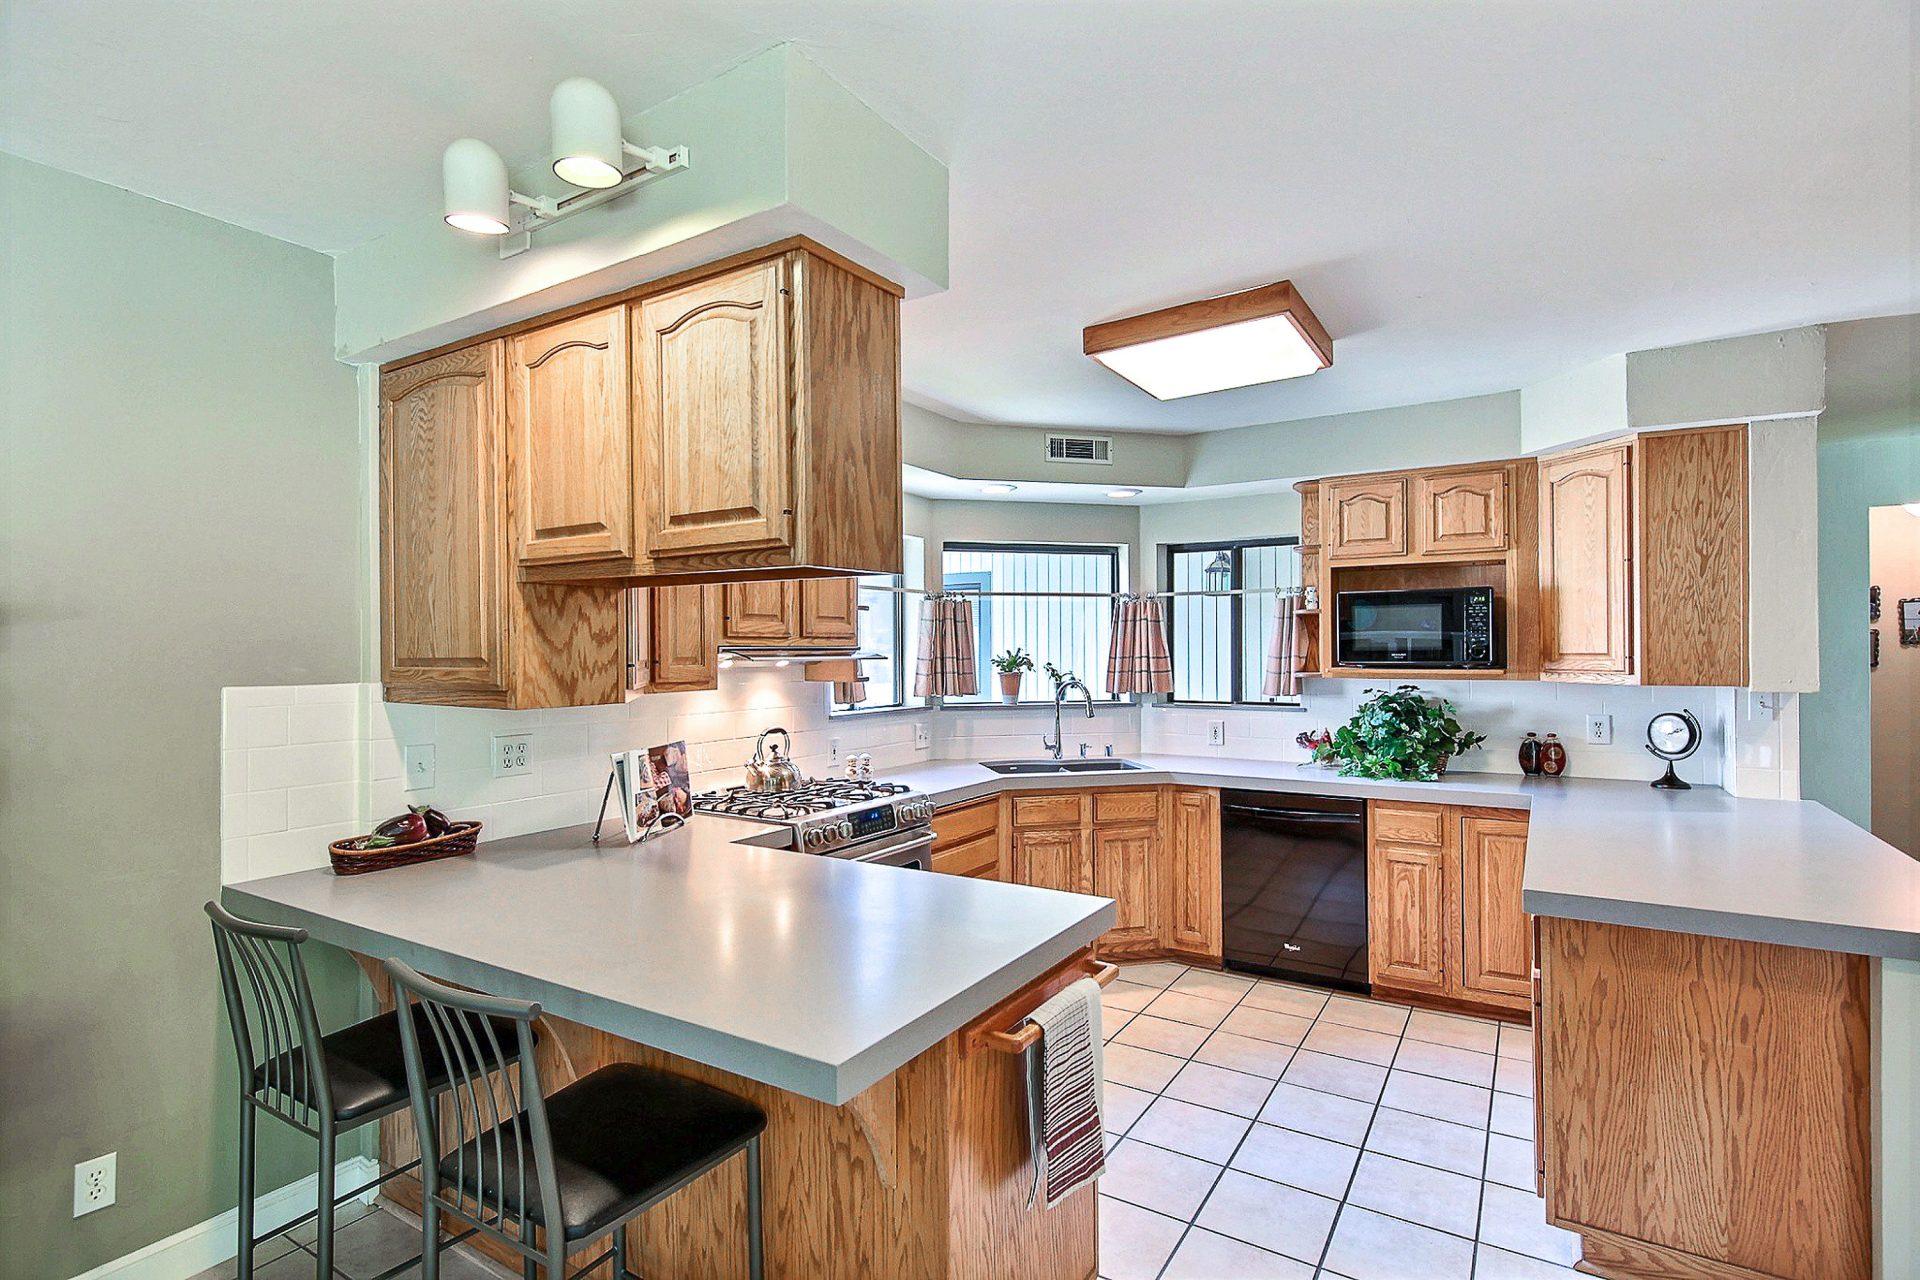 Kitchen alteration